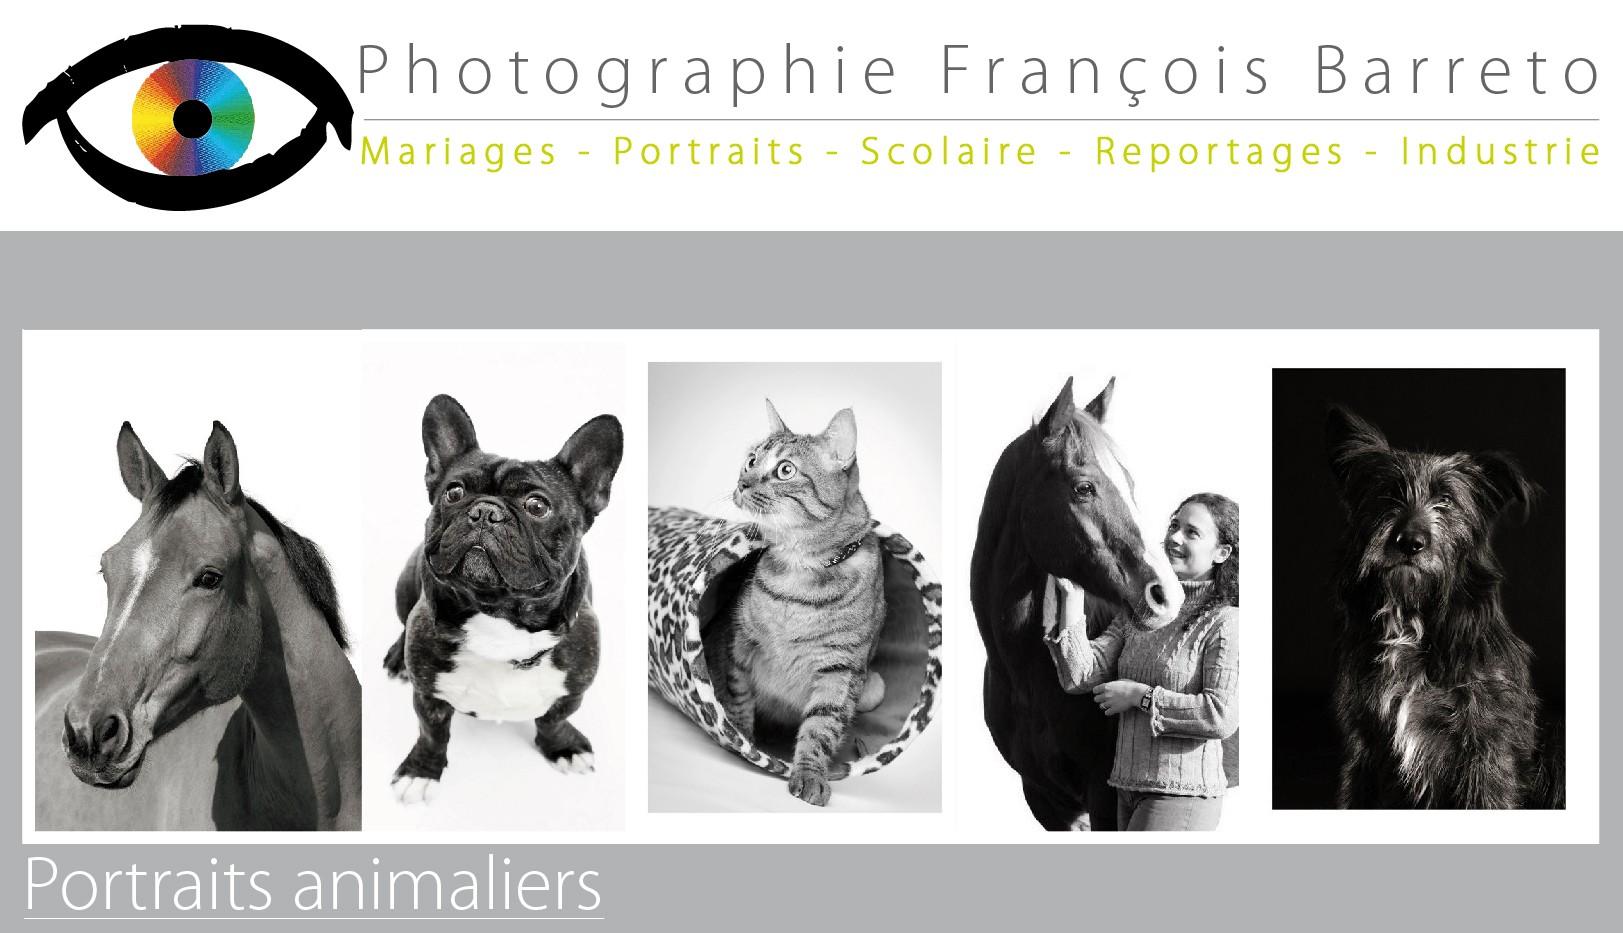 Portraits animaliers